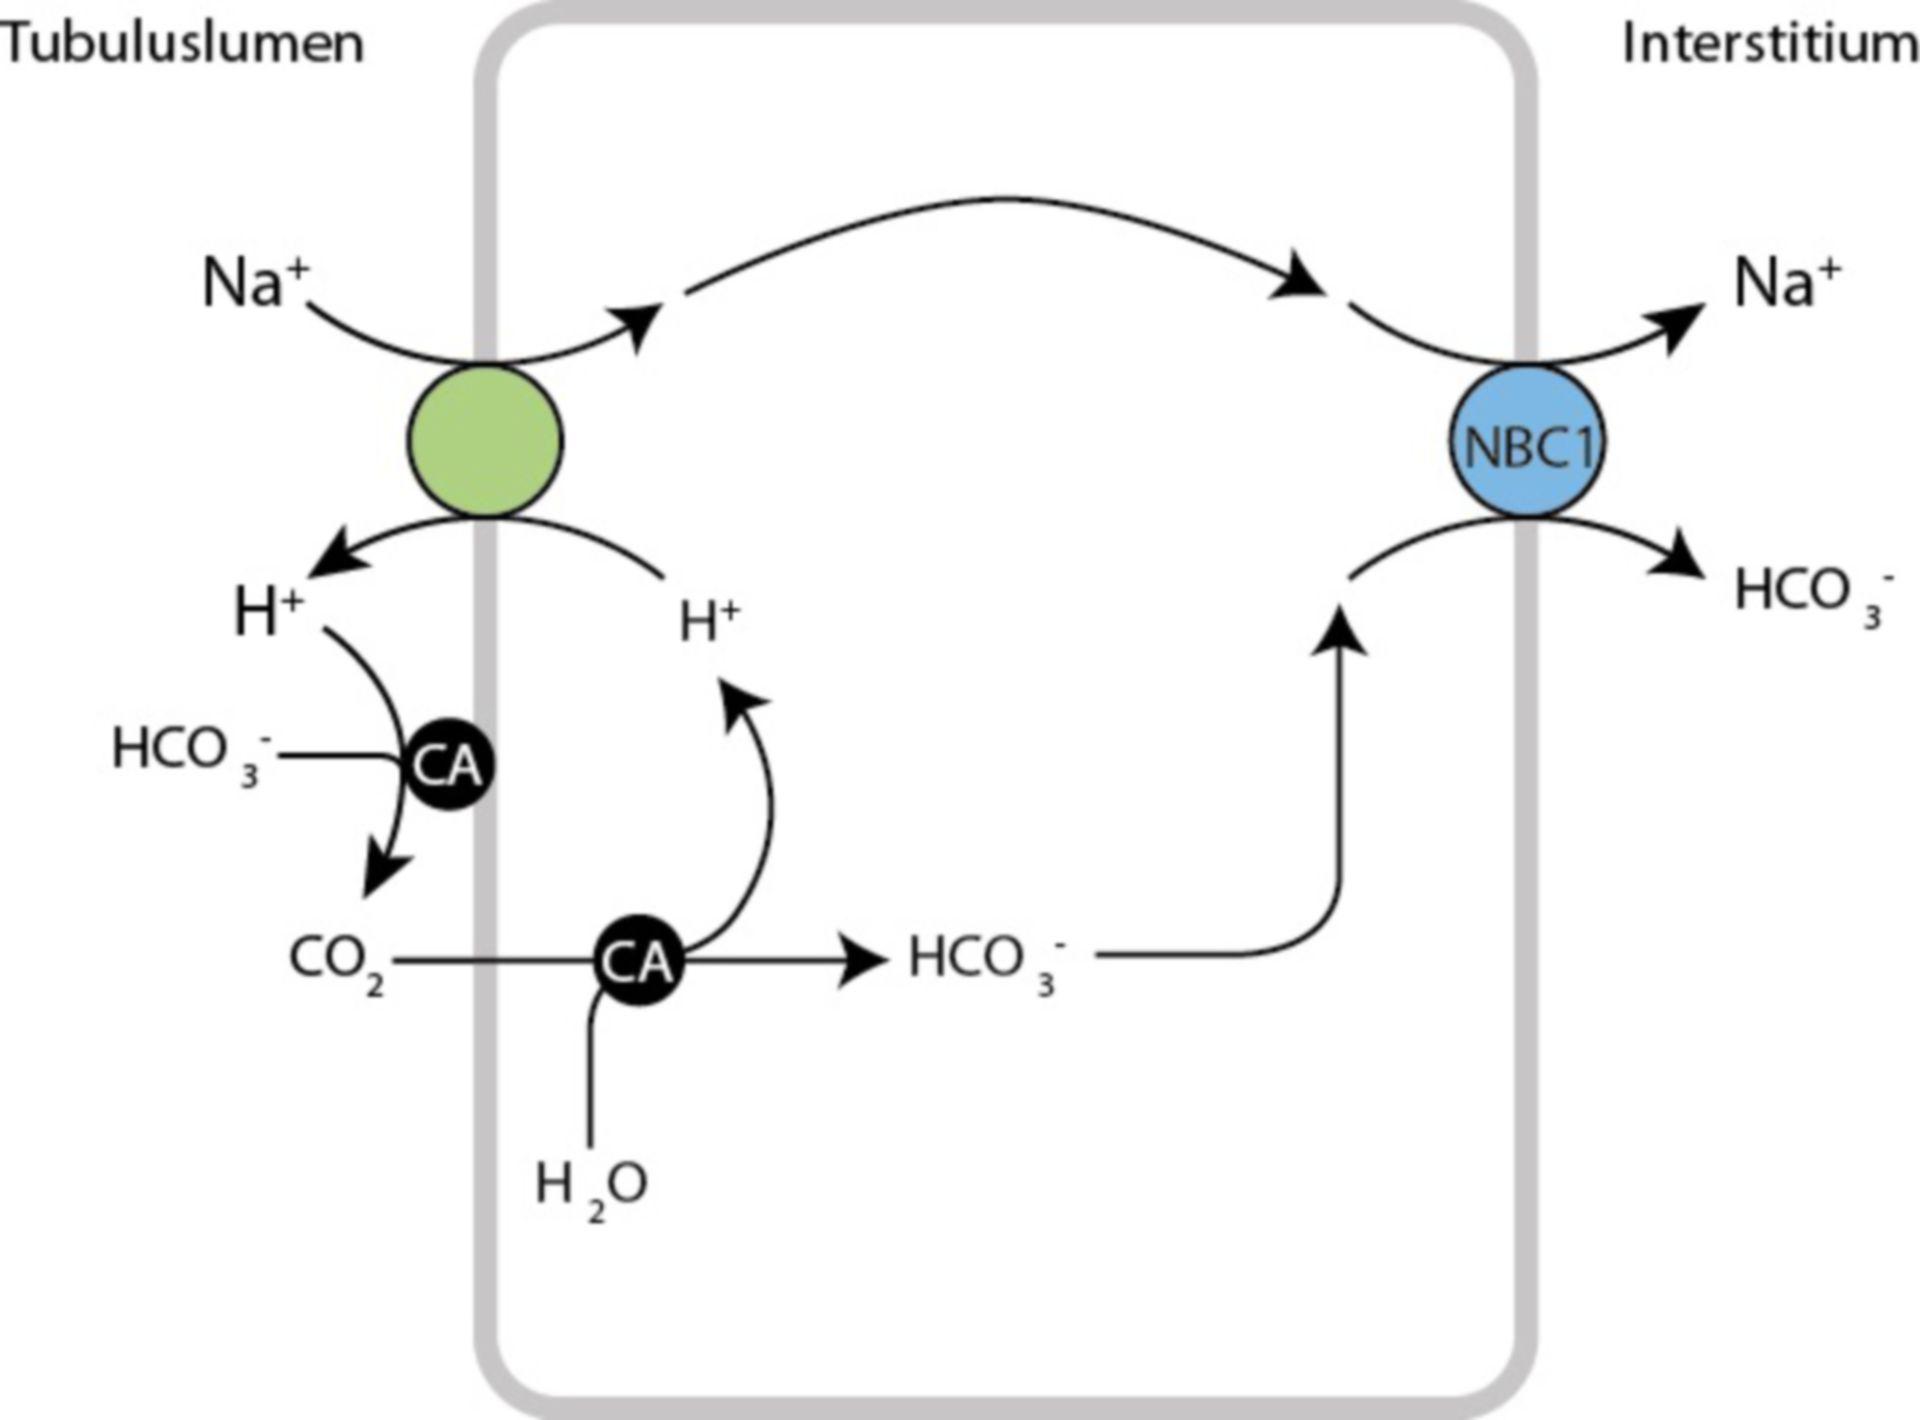 Bicarbonate resorption in the proximal tubule